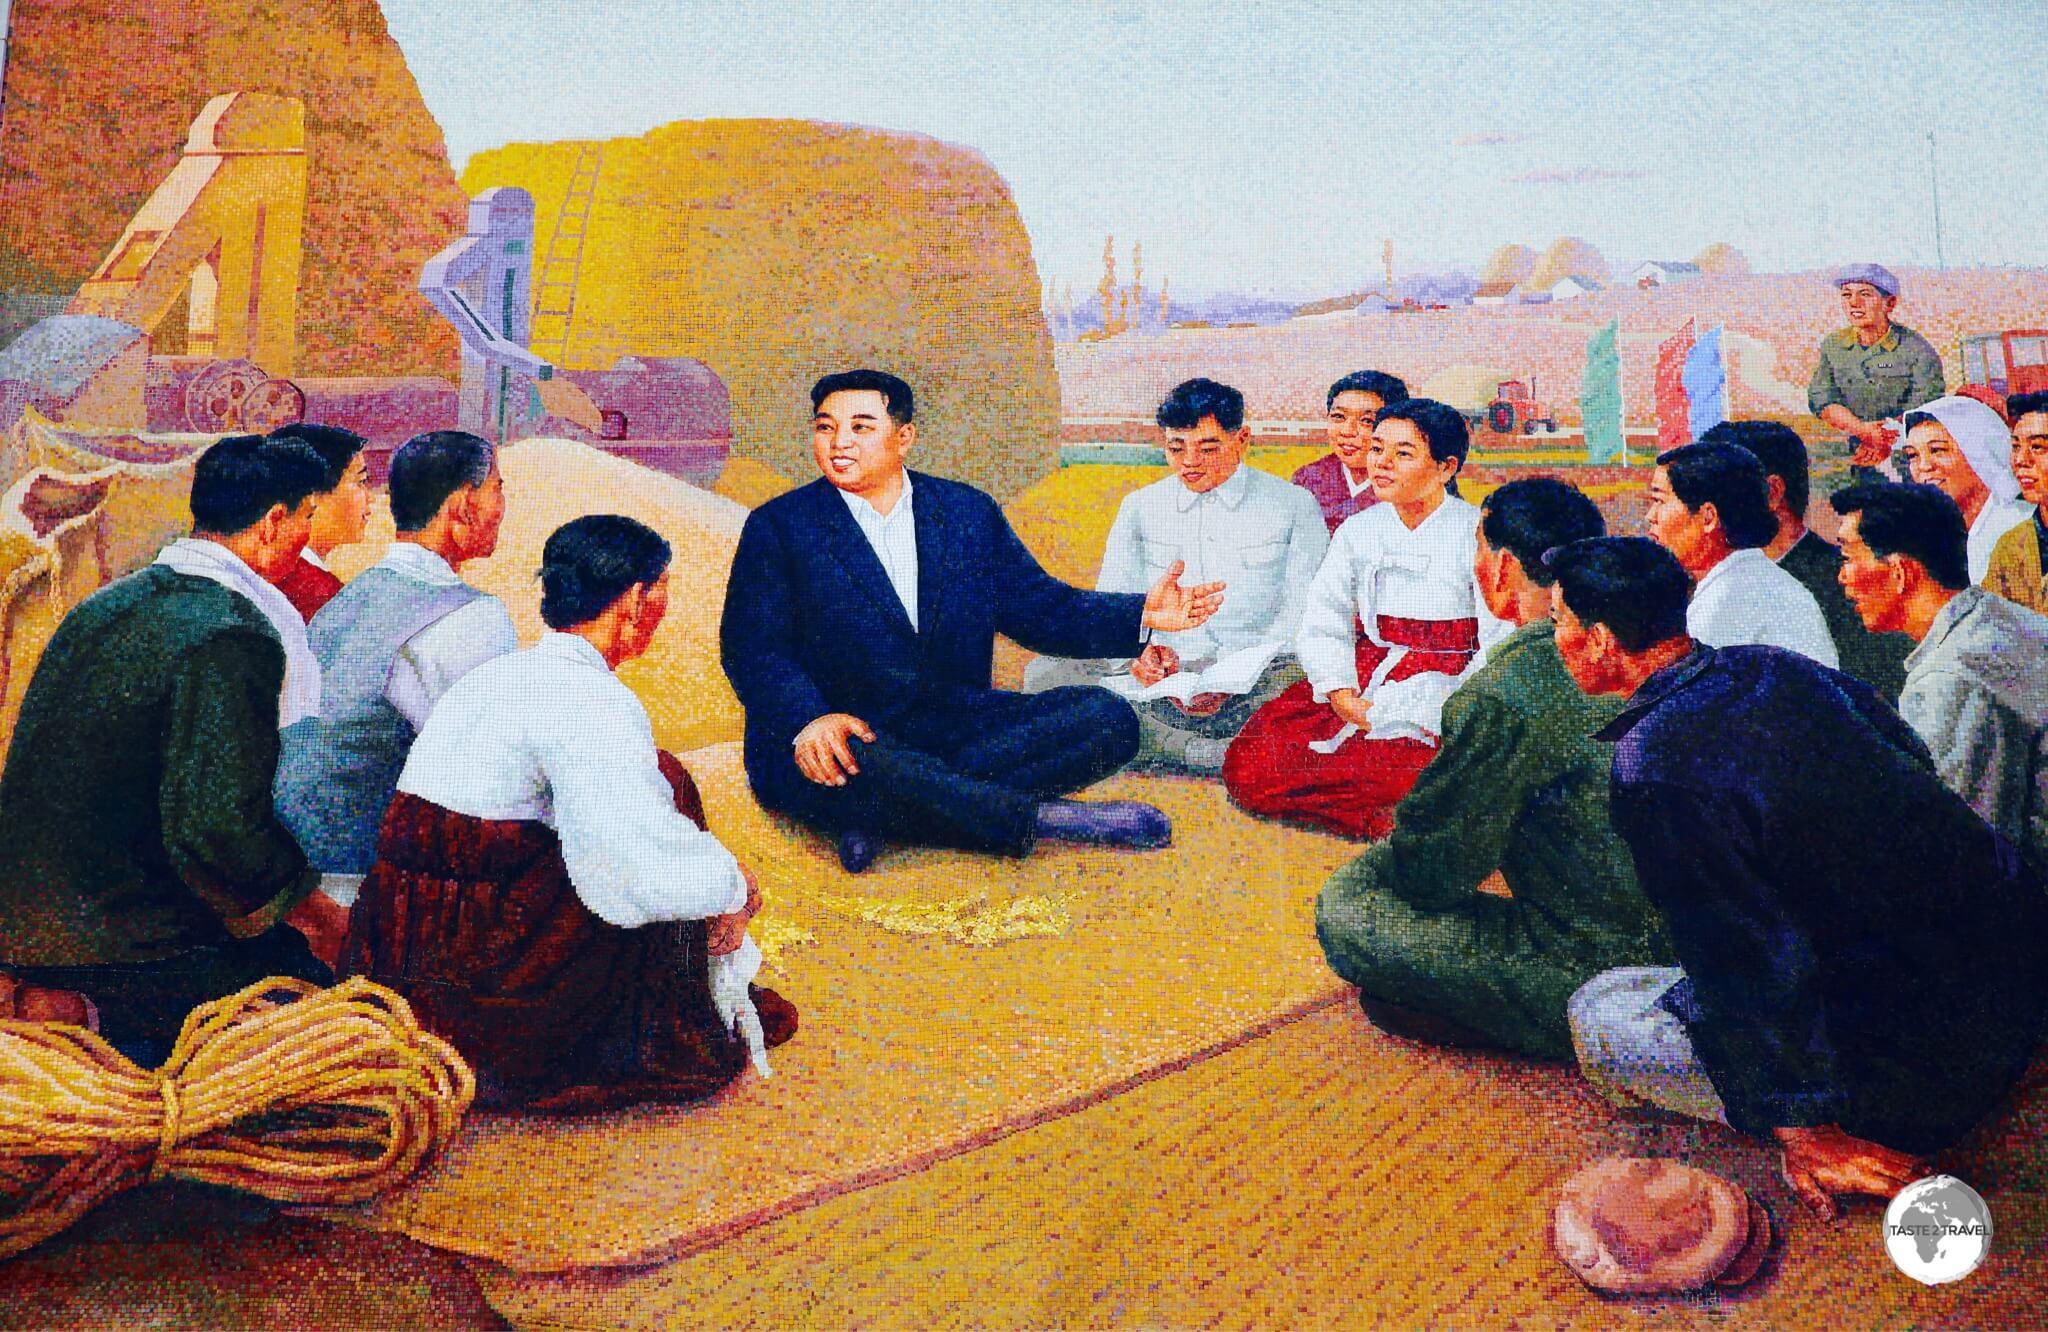 Tile mosaic propaganda billboard at Chongsan Co-operative farm commemorates the visit of Kim Il-sung